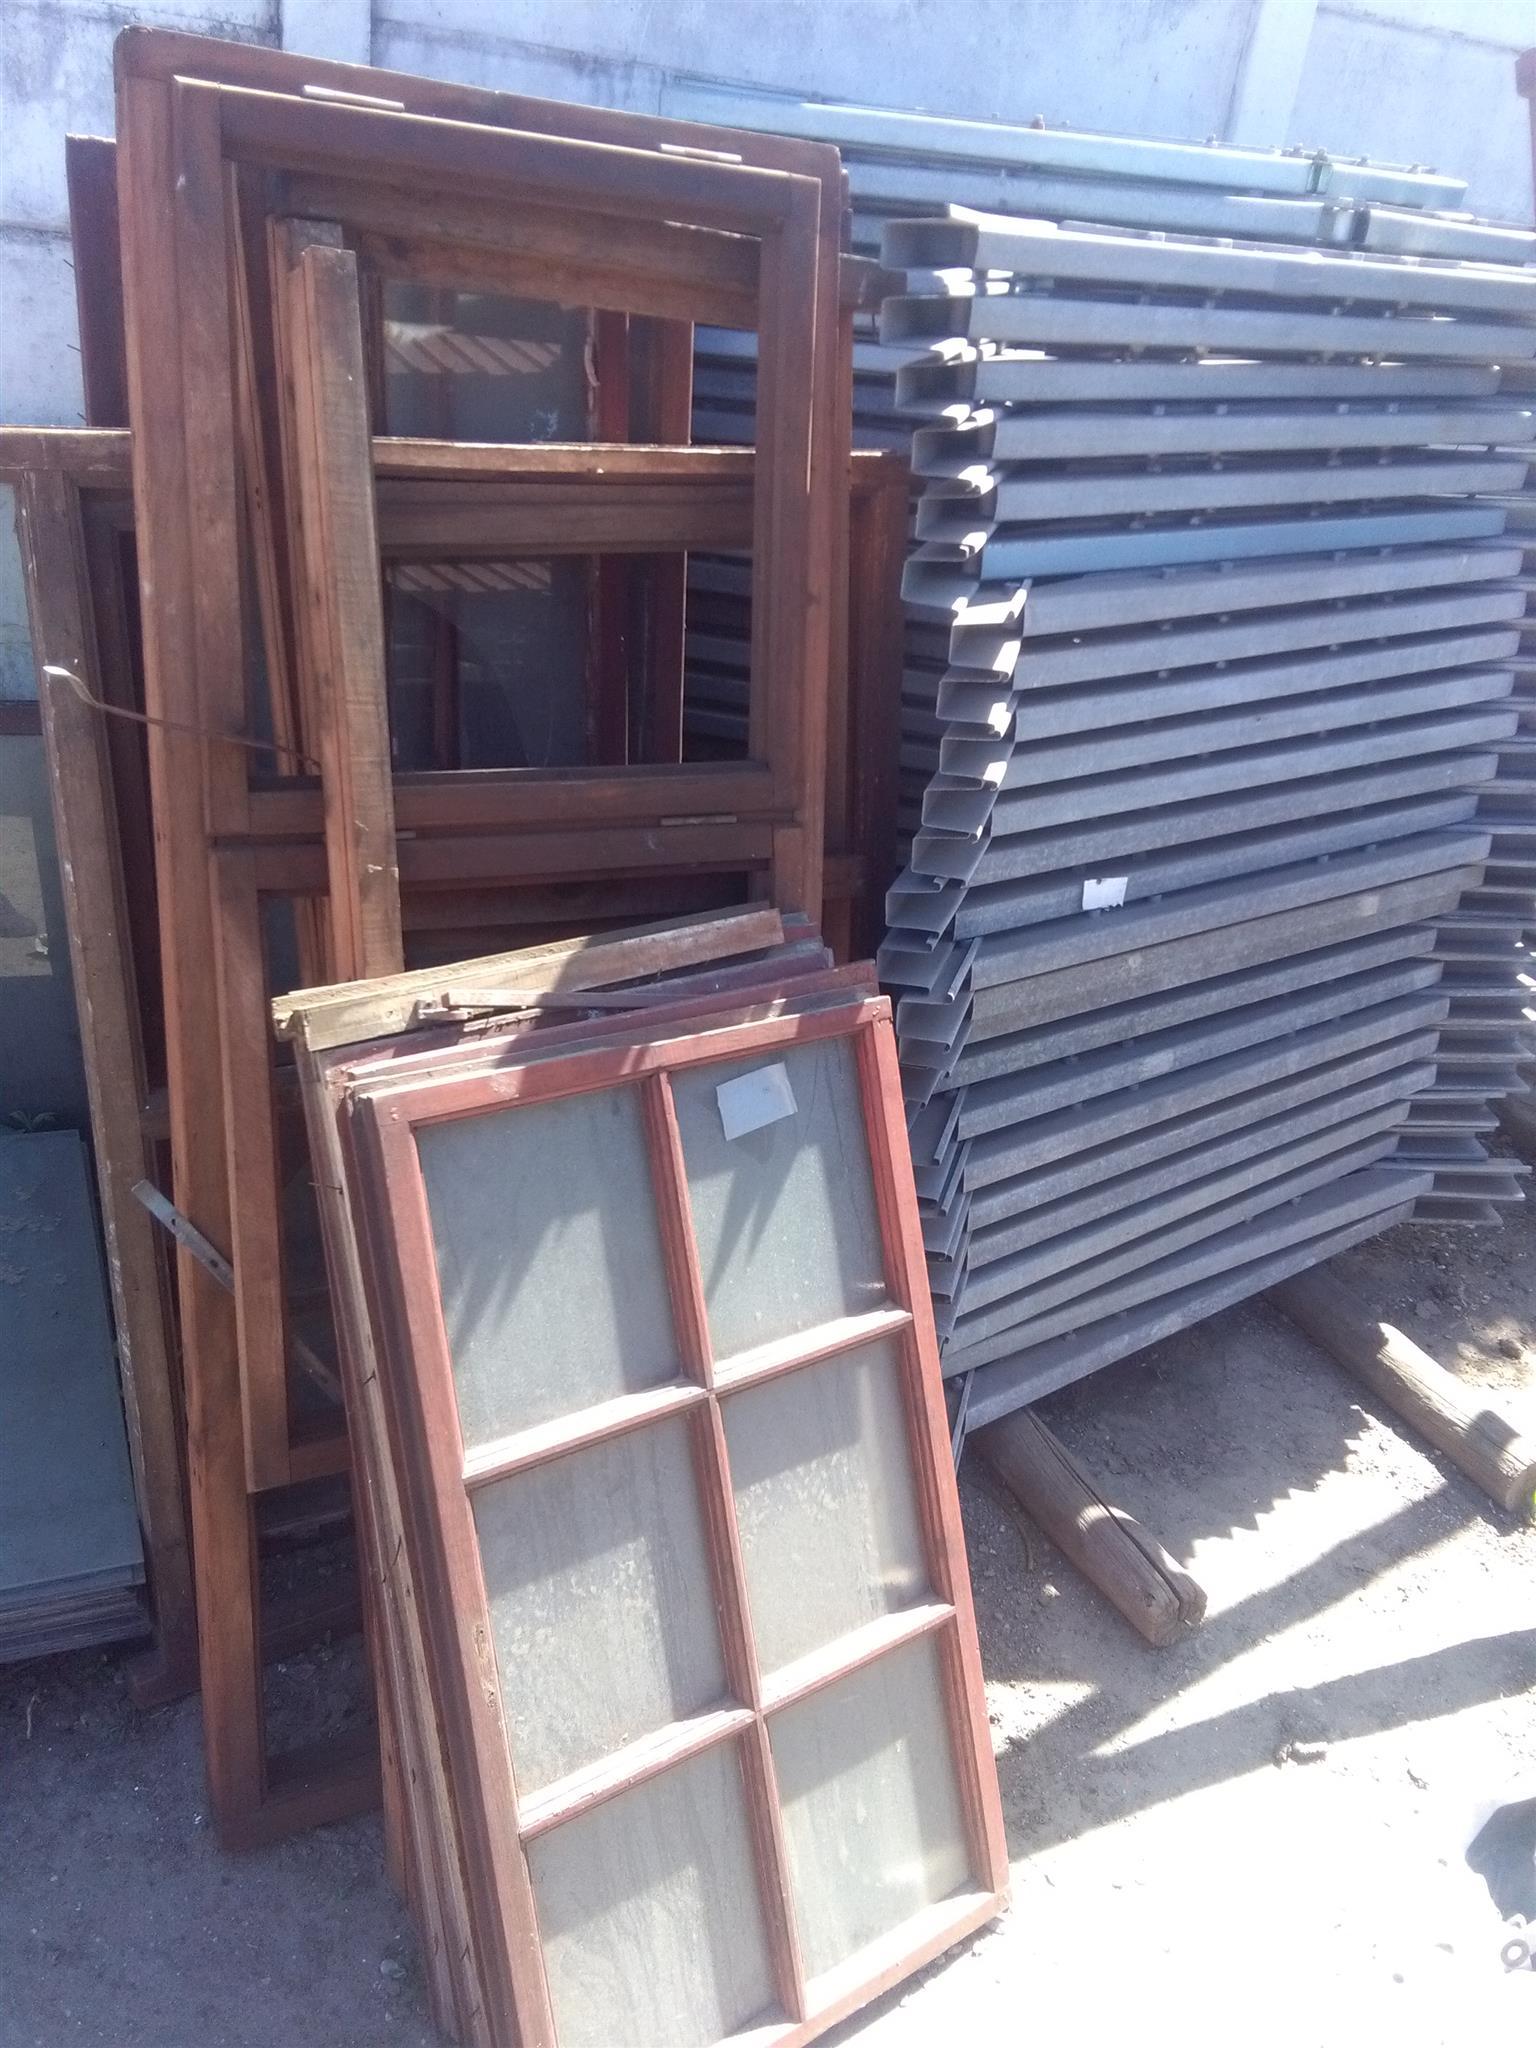 Sliding door window glass and other window frames gets